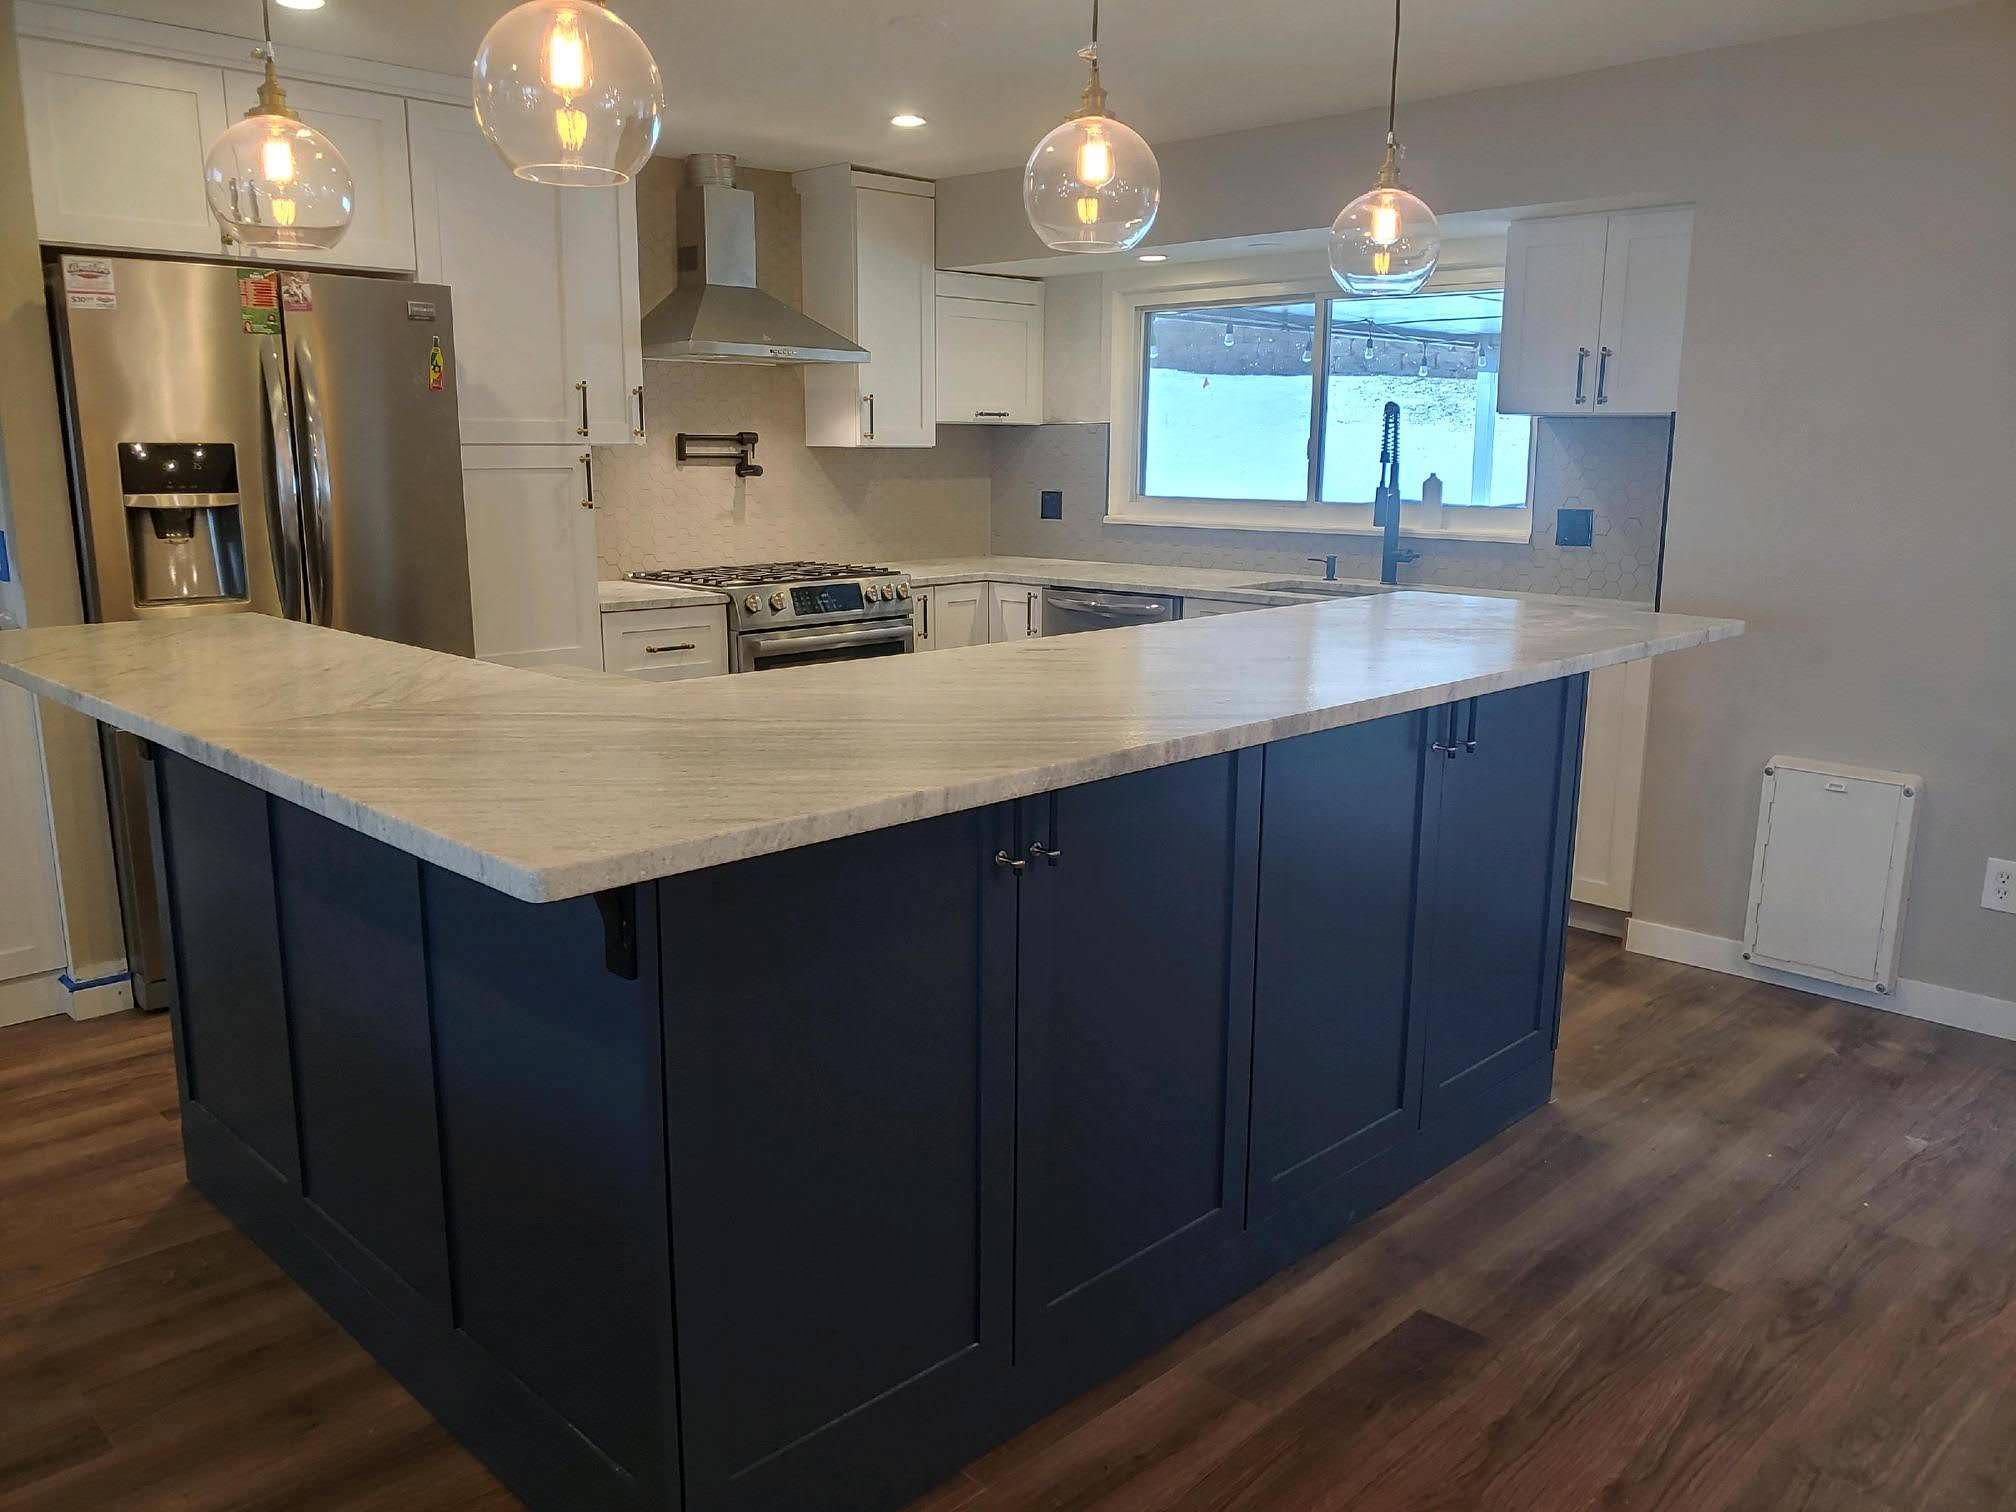 West Littleton Kitchen remodel